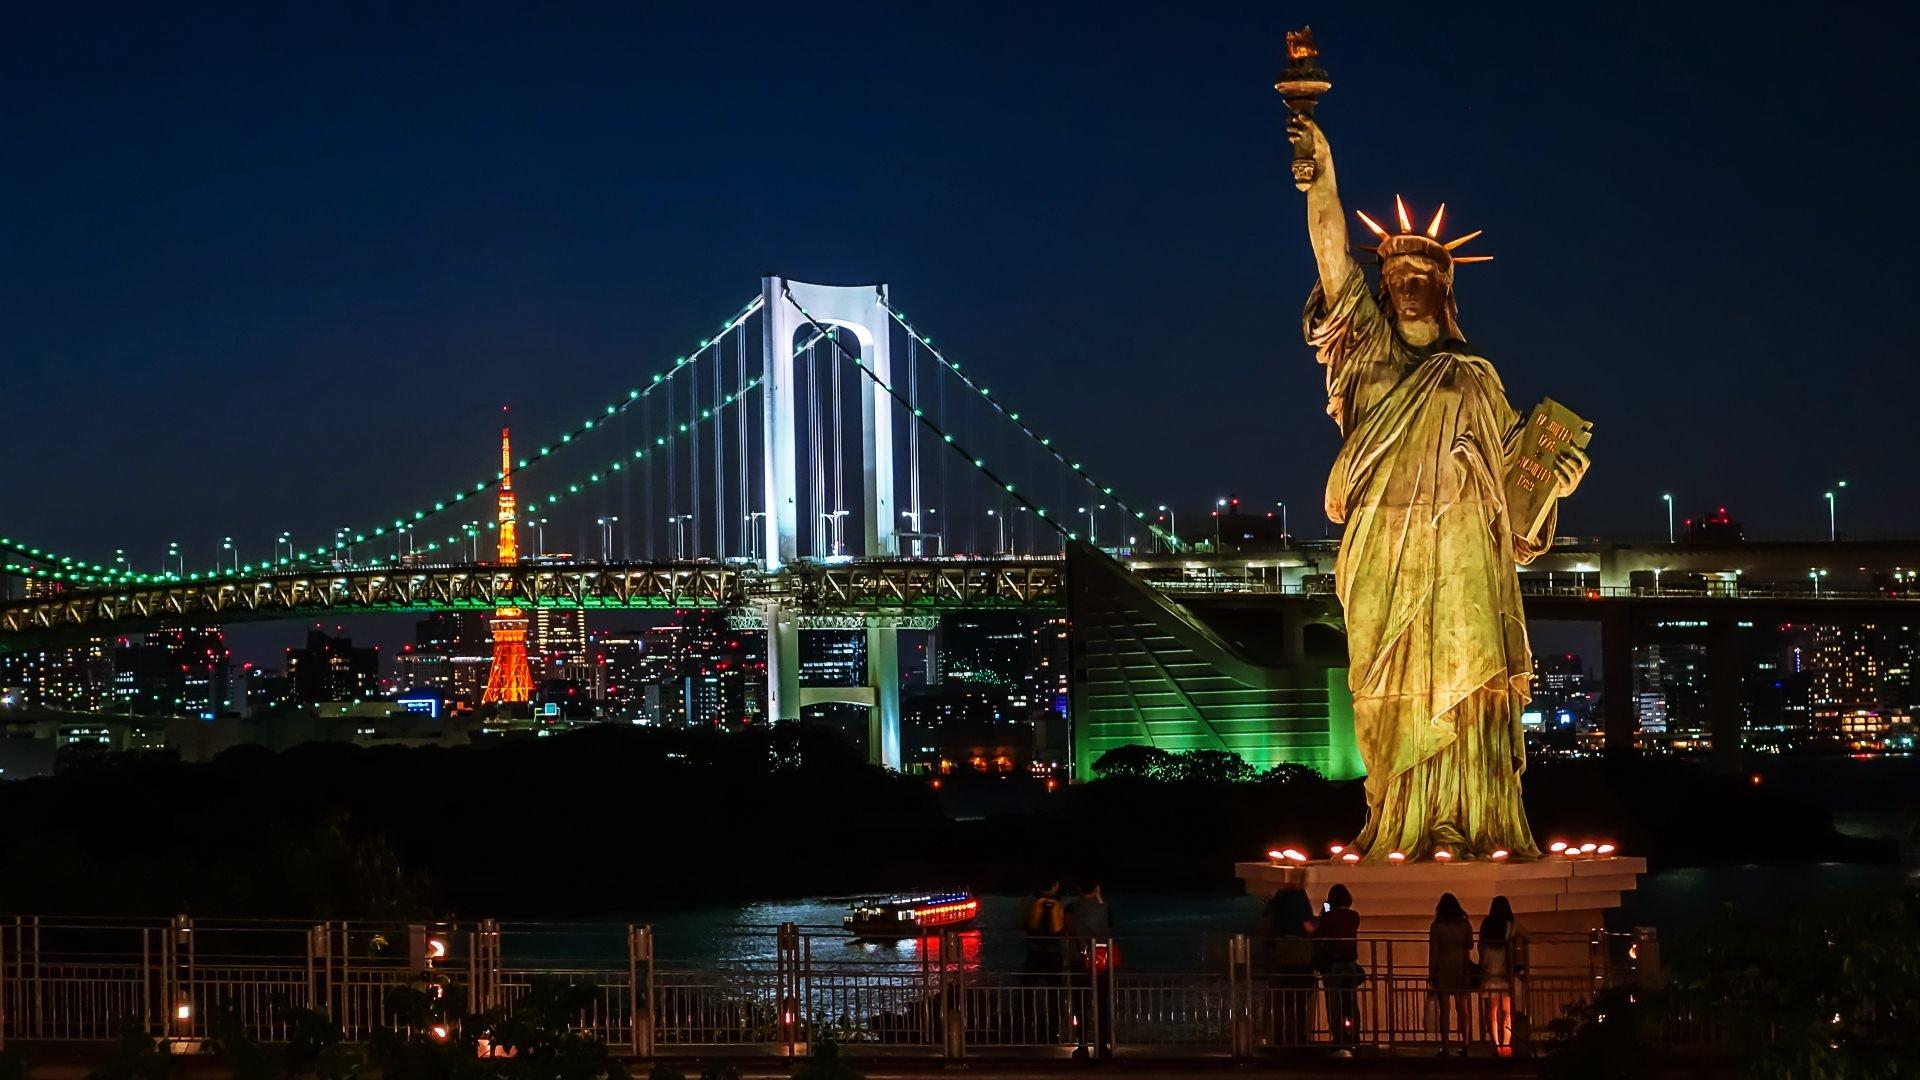 Niagara Falls Wallpaper 1920x1080 Statue Of Liberty Visit All Over The World